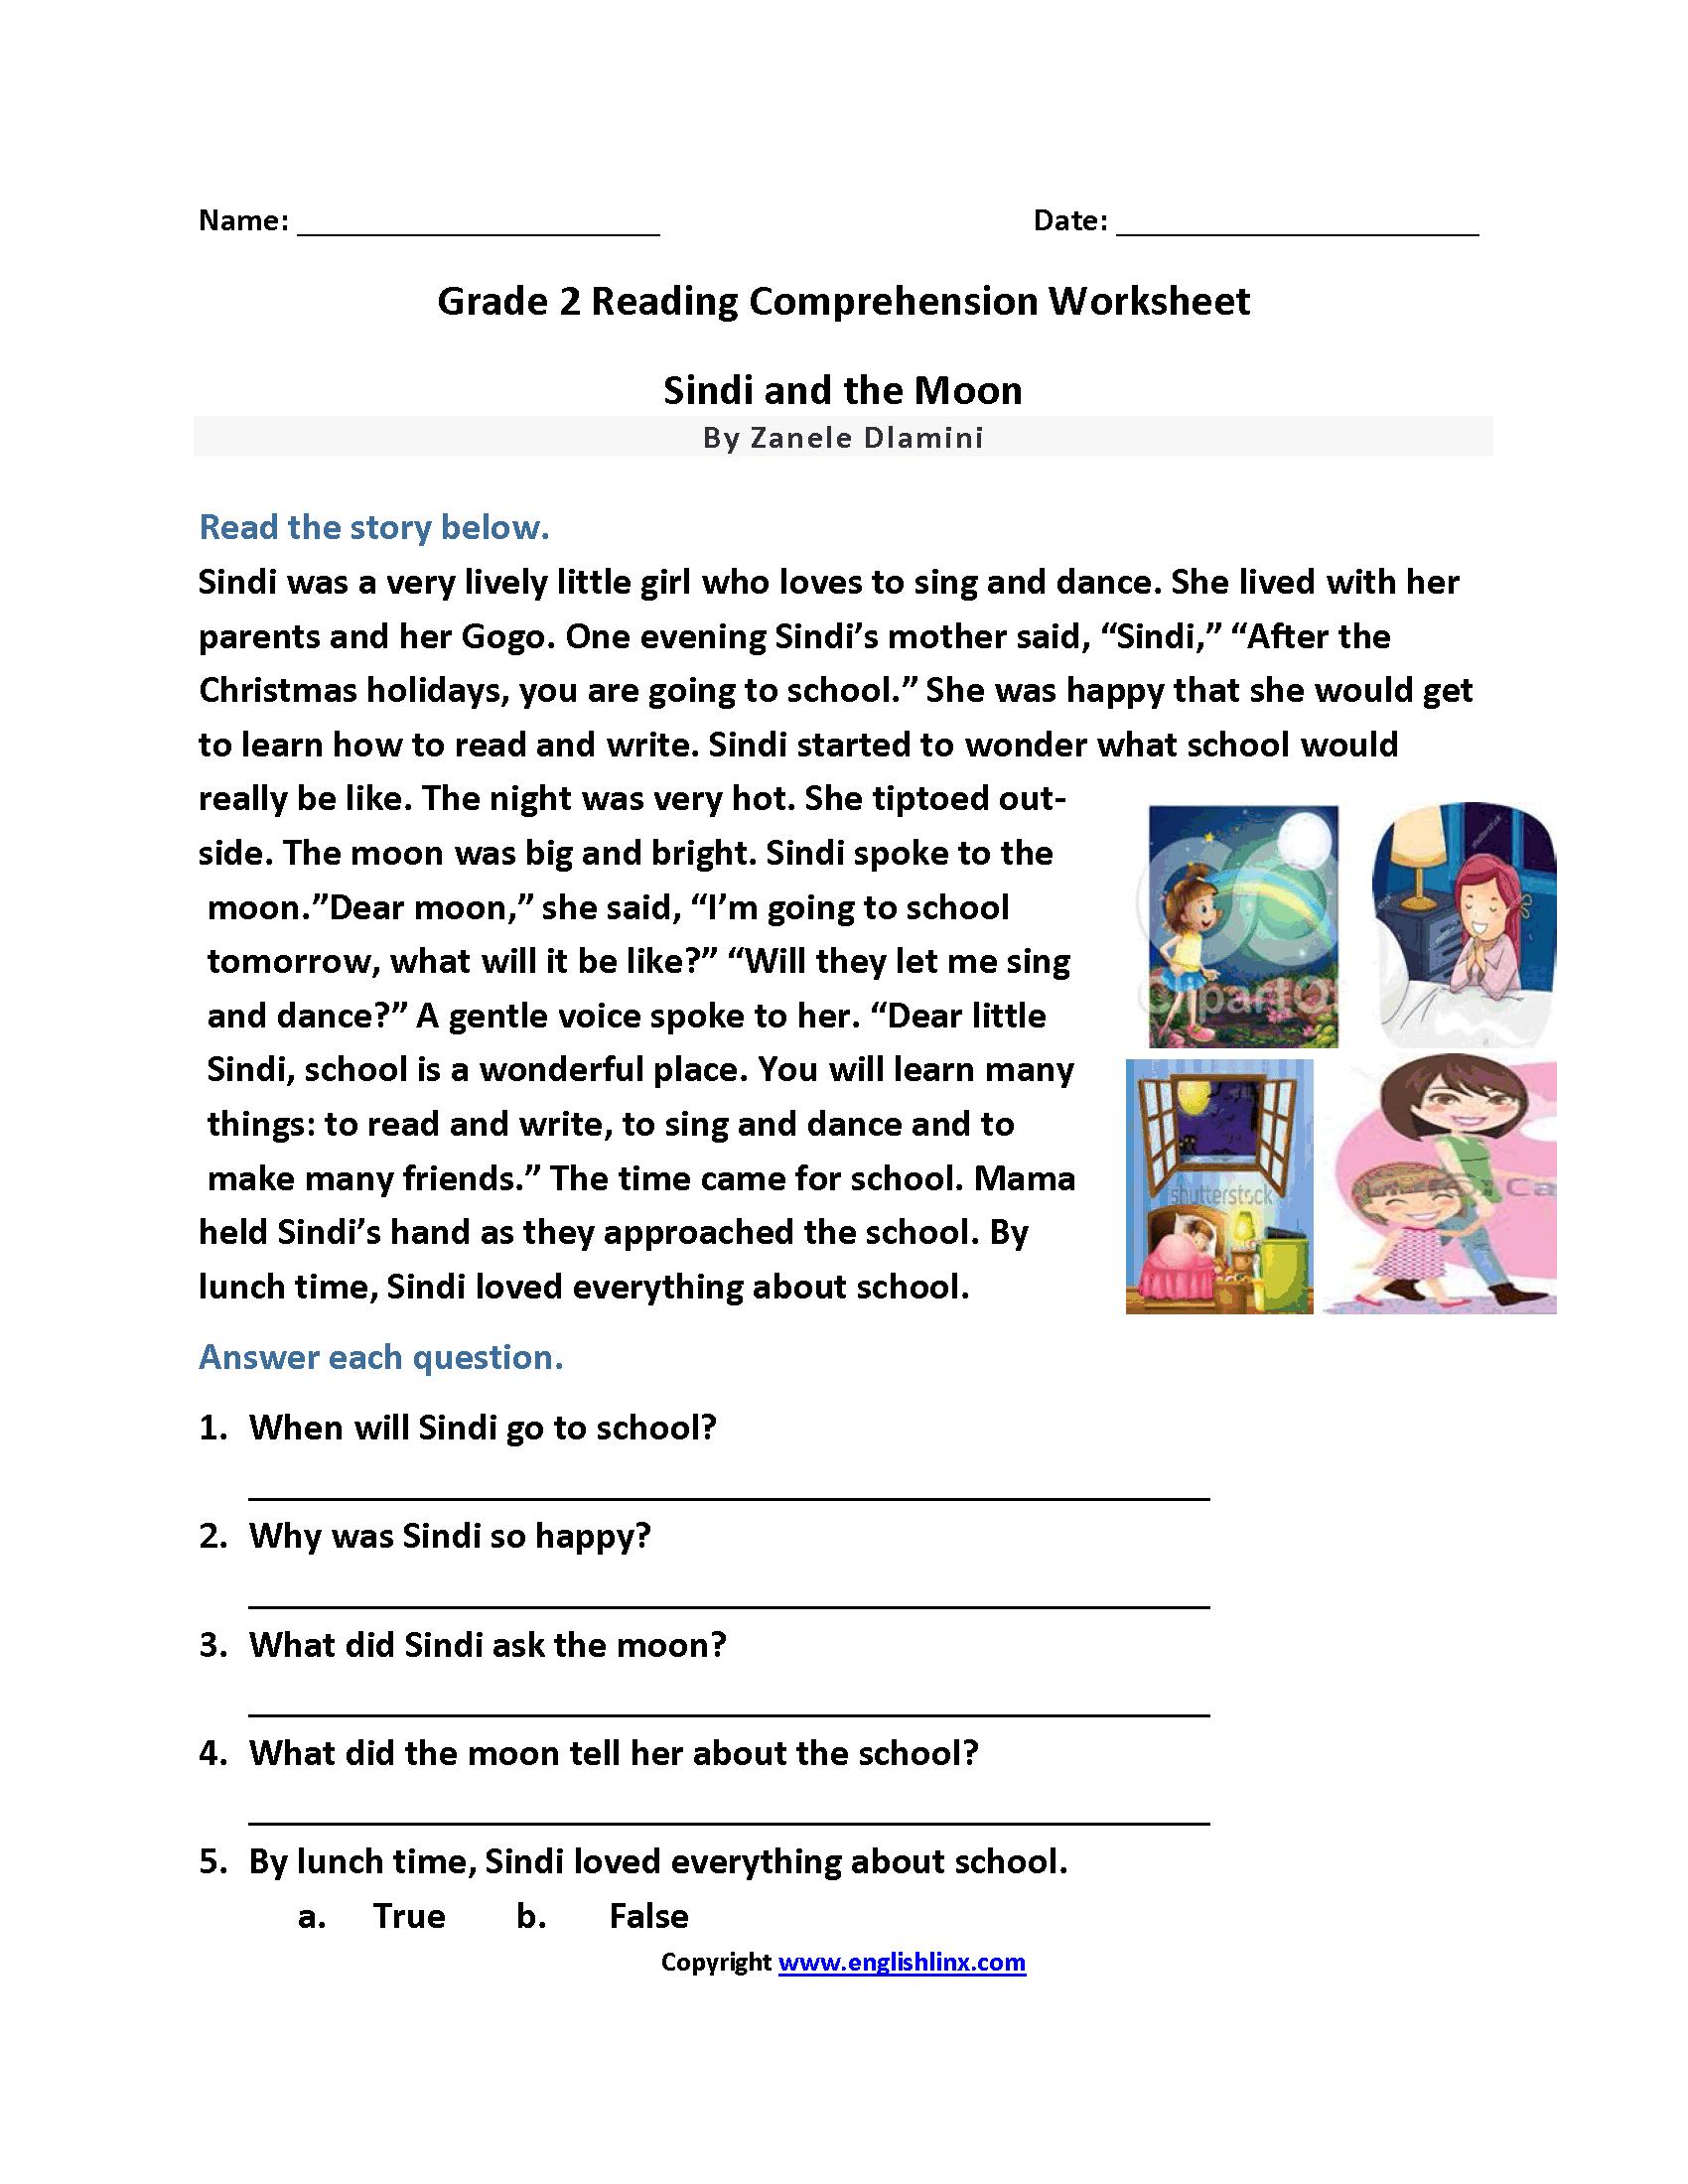 Reading Worksheets  Second Grade Reading Worksheets Along With Second Grade Reading Comprehension Worksheets